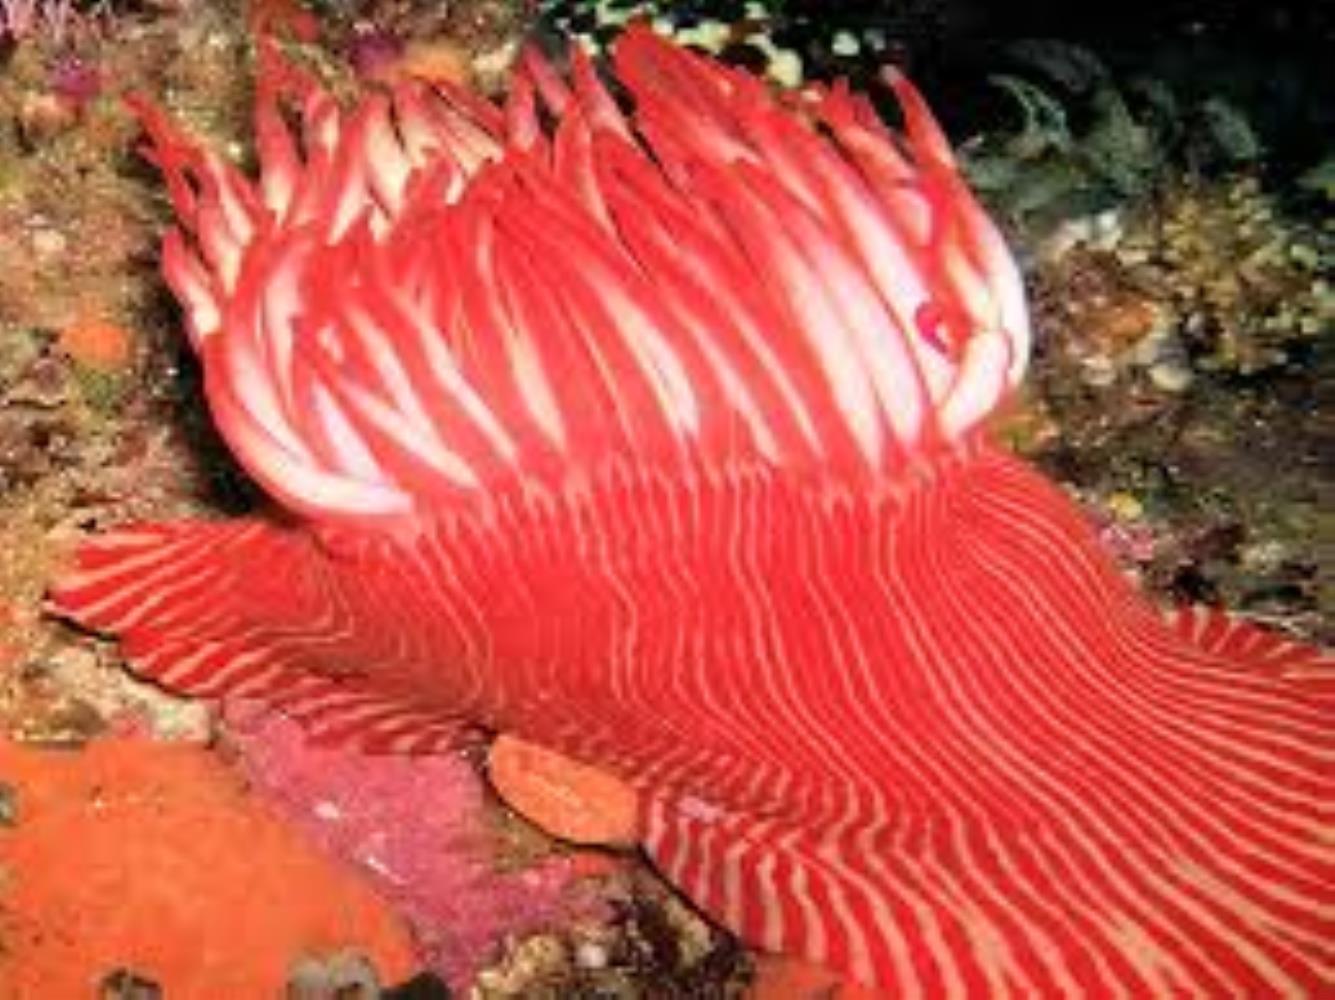 Candy-striped anemone